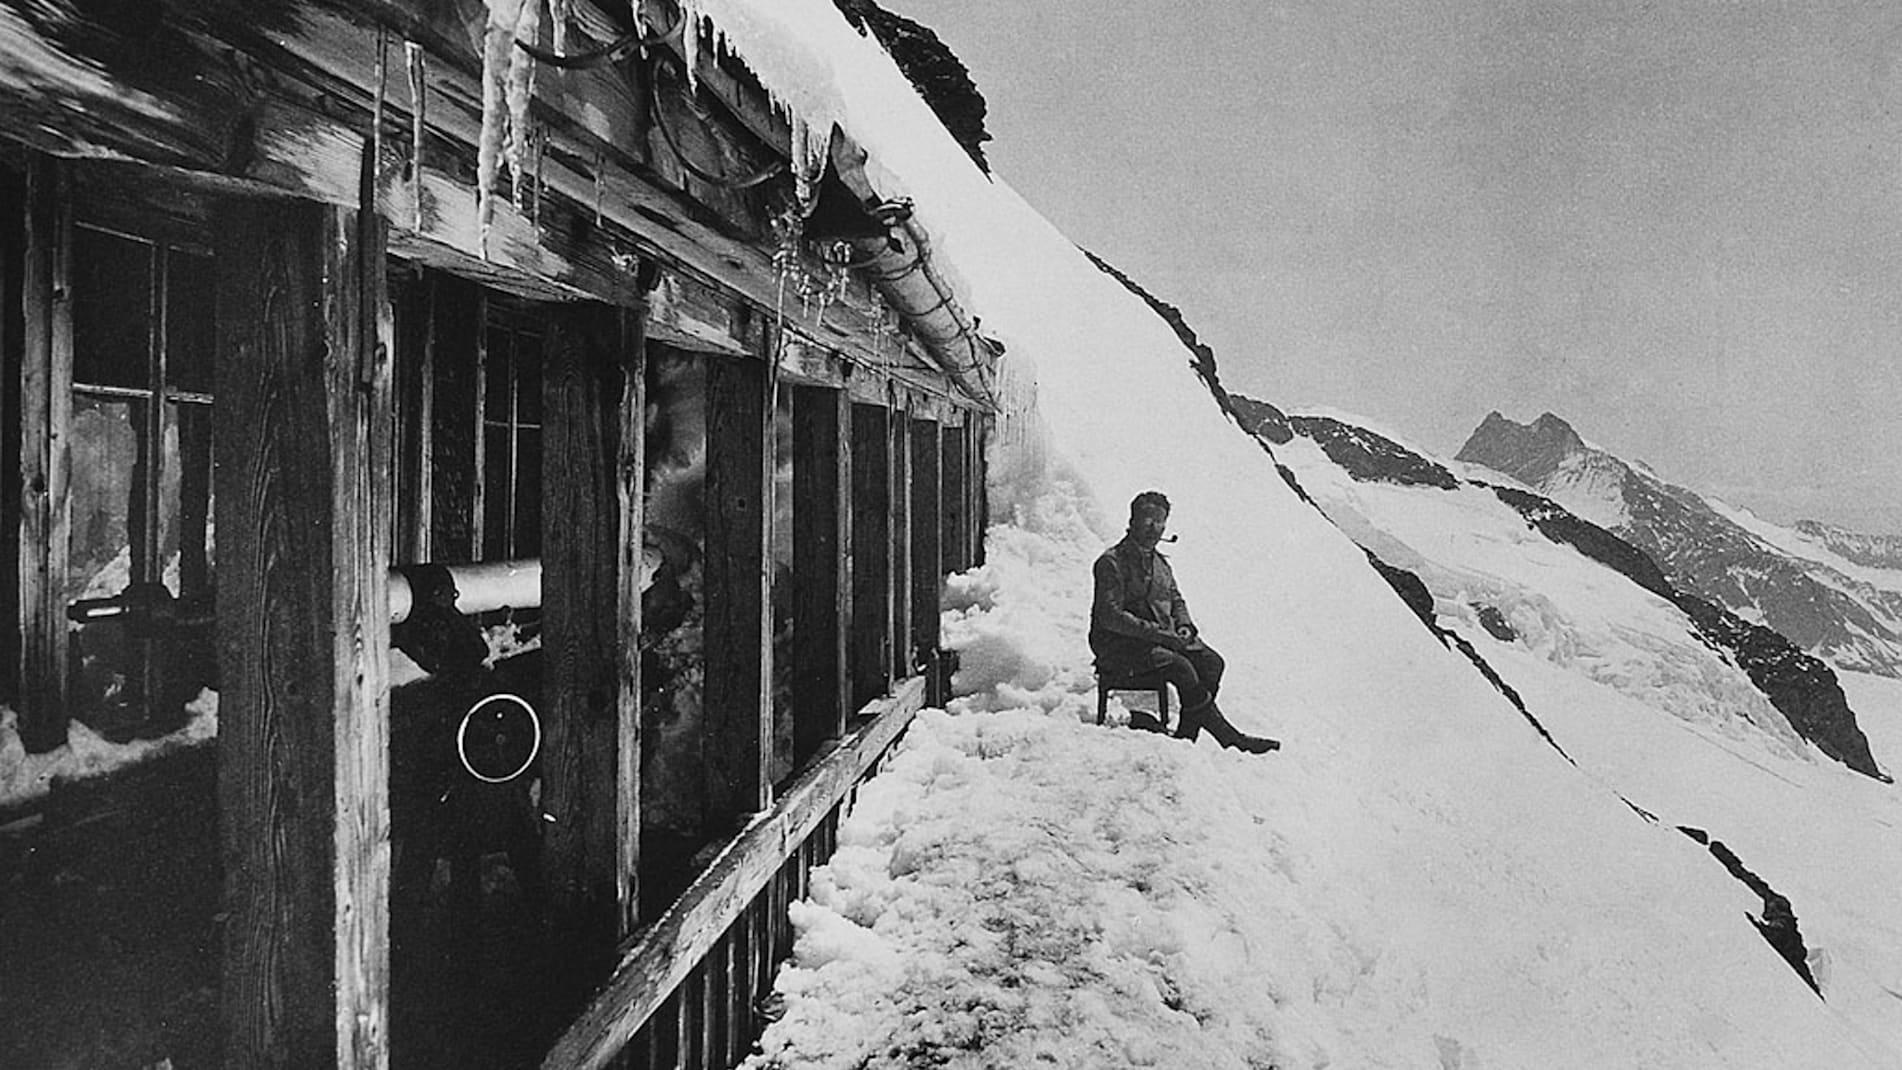 Bau der Jungfraubahn23